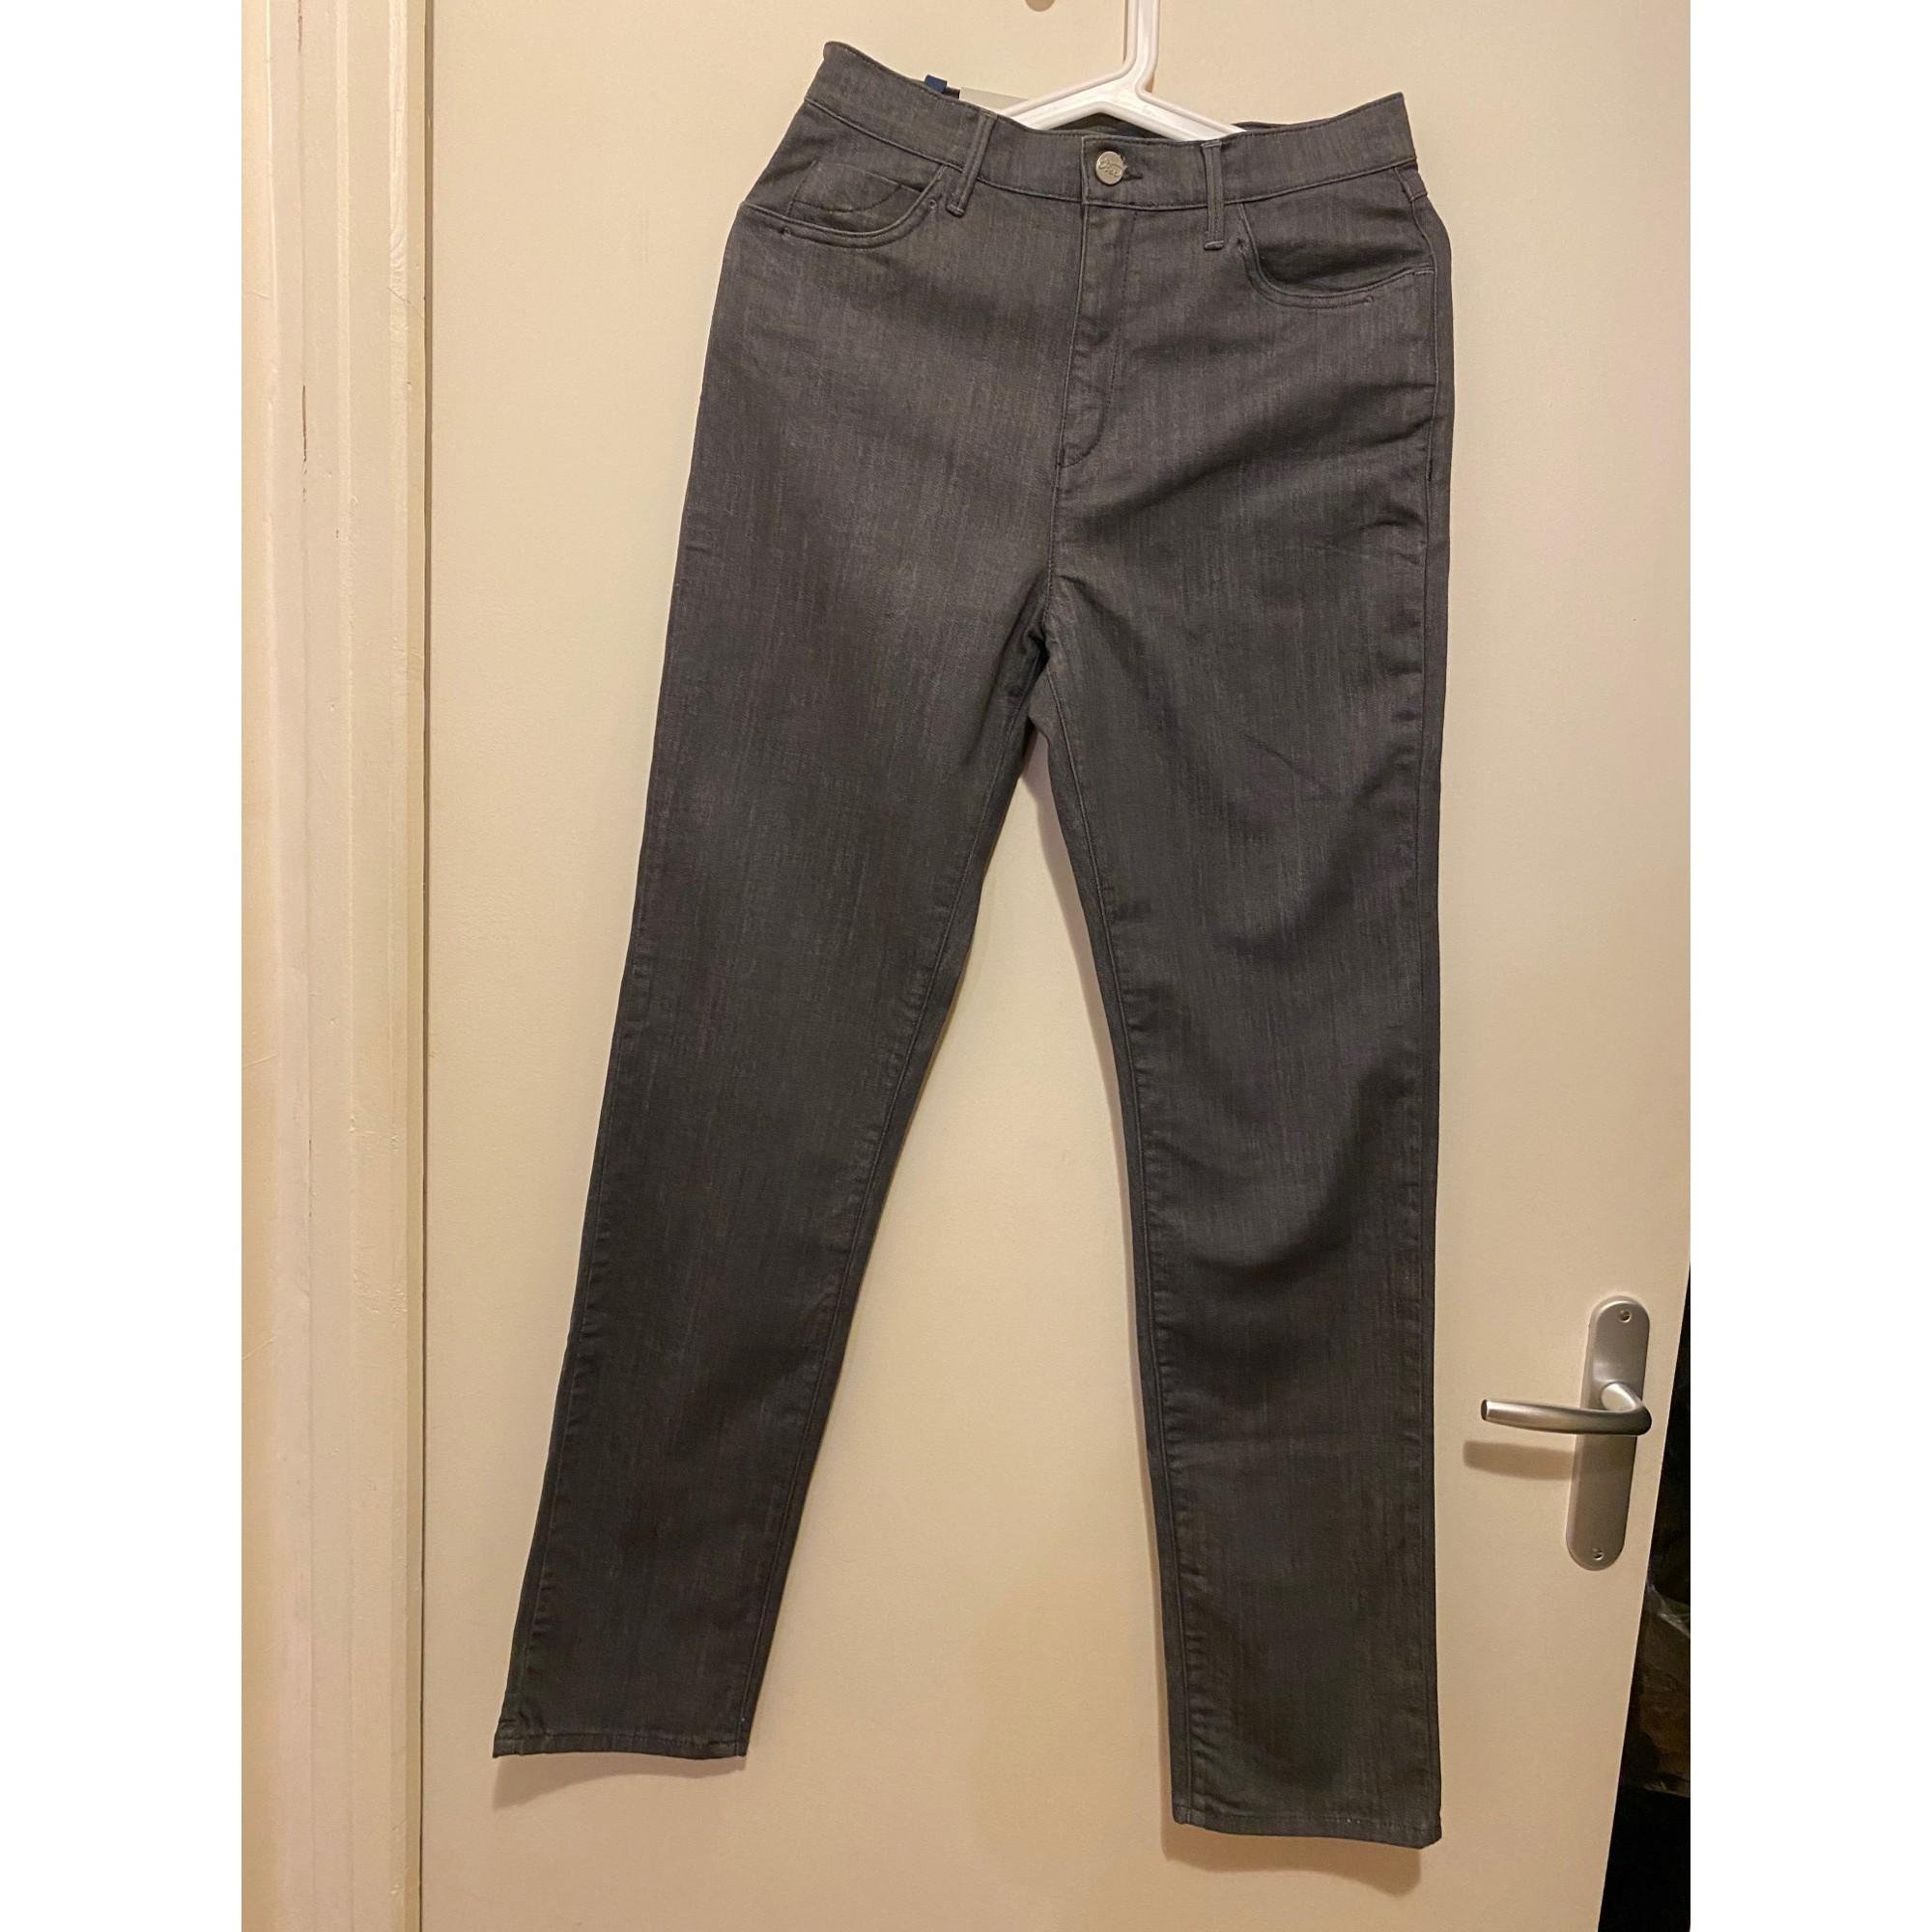 Jeans droit OBER Gris, anthracite